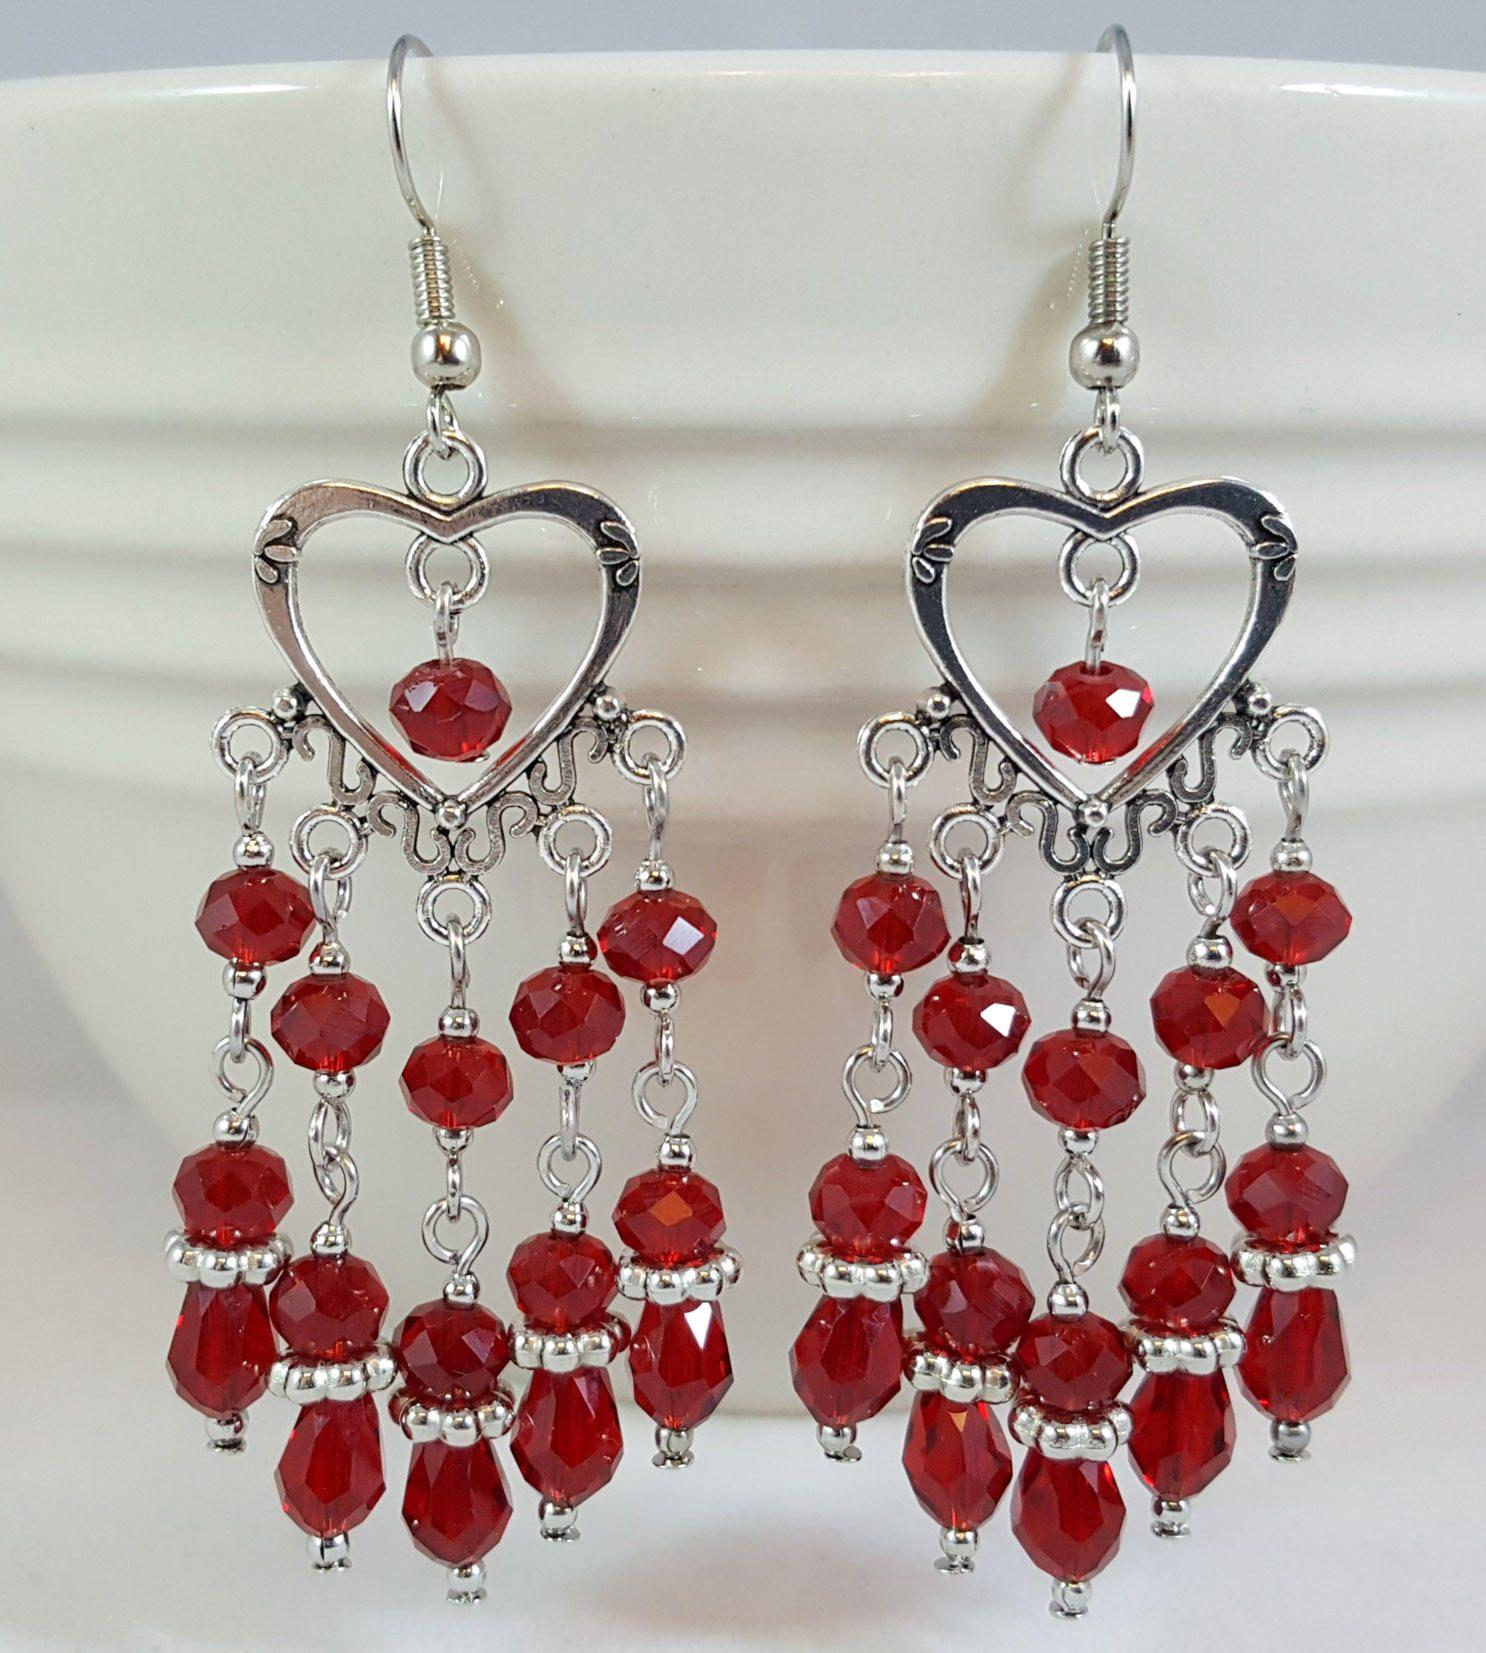 Red heart chandelier earrings heart earrings chandelier earrings red heart chandelier earrings heart earrings chandelier earrings valentines day gift statement earrings gift for wife girlfriend gift arubaitofo Choice Image